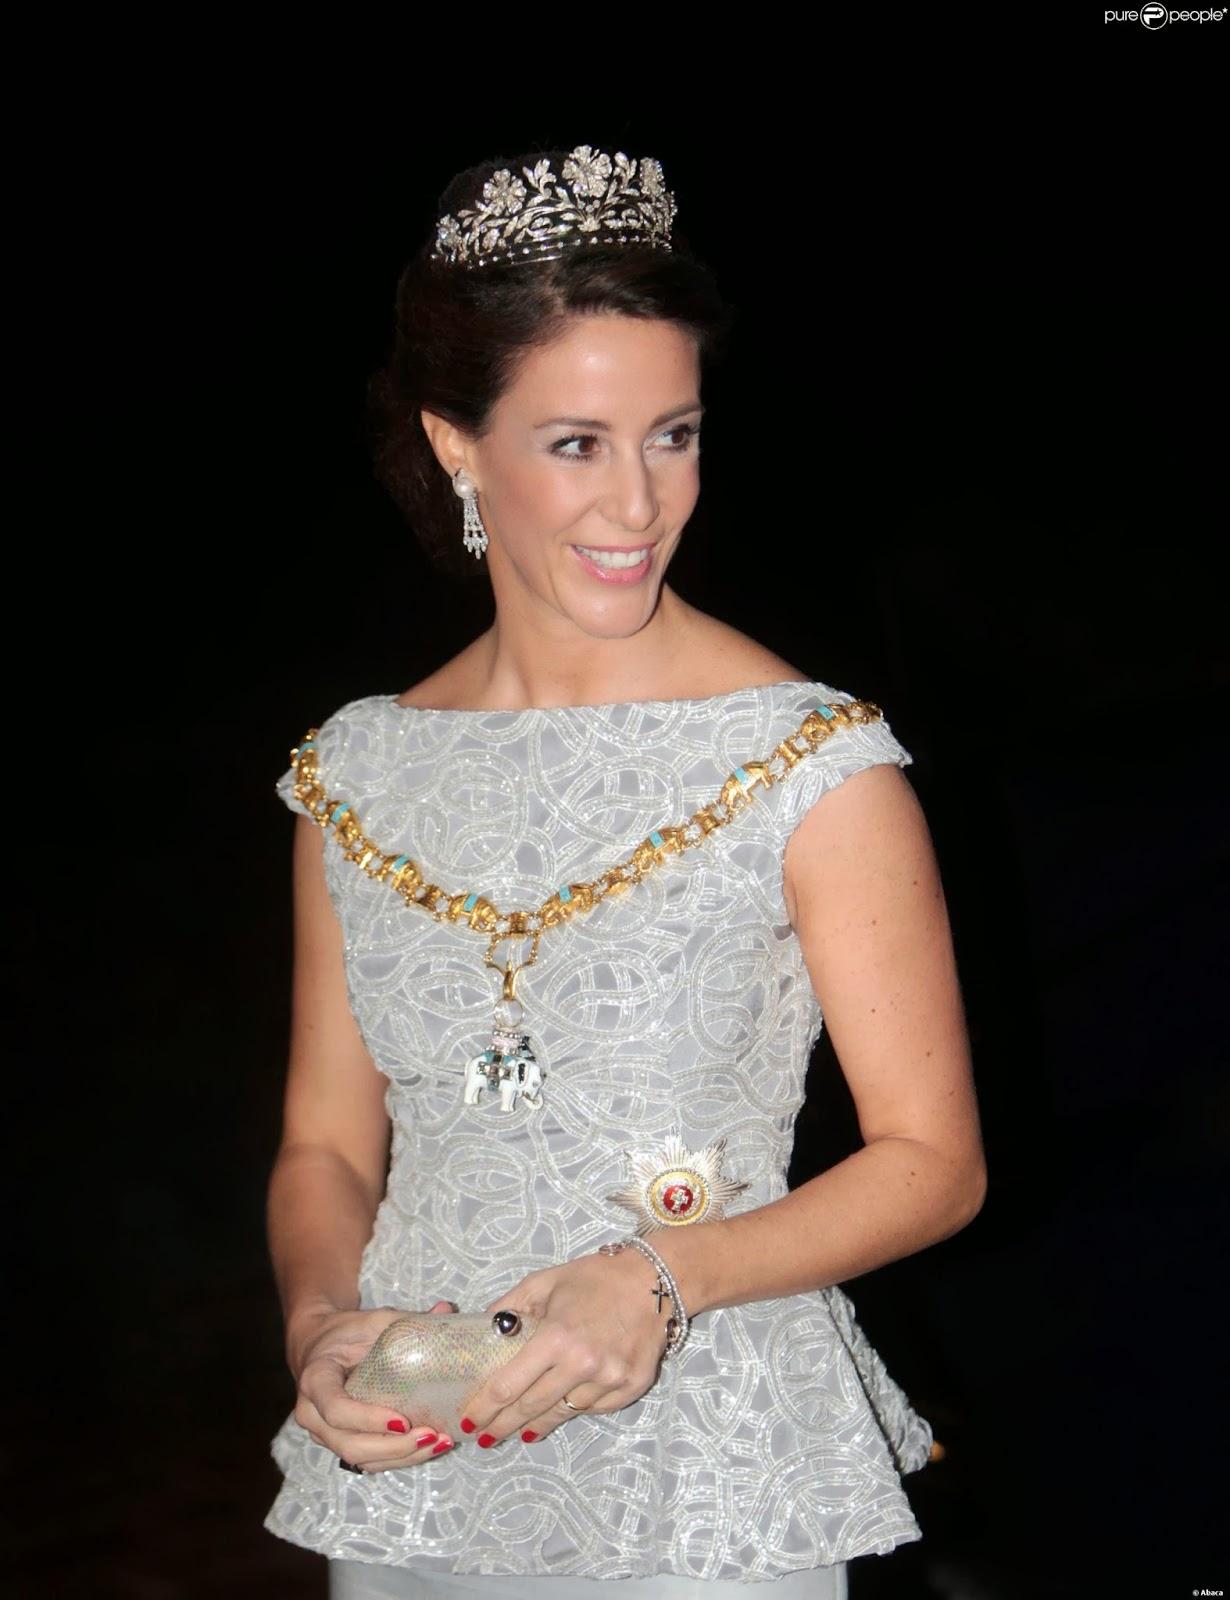 1345905-princess-mariearriving-at-the-new-year-2000x0-1.jpg